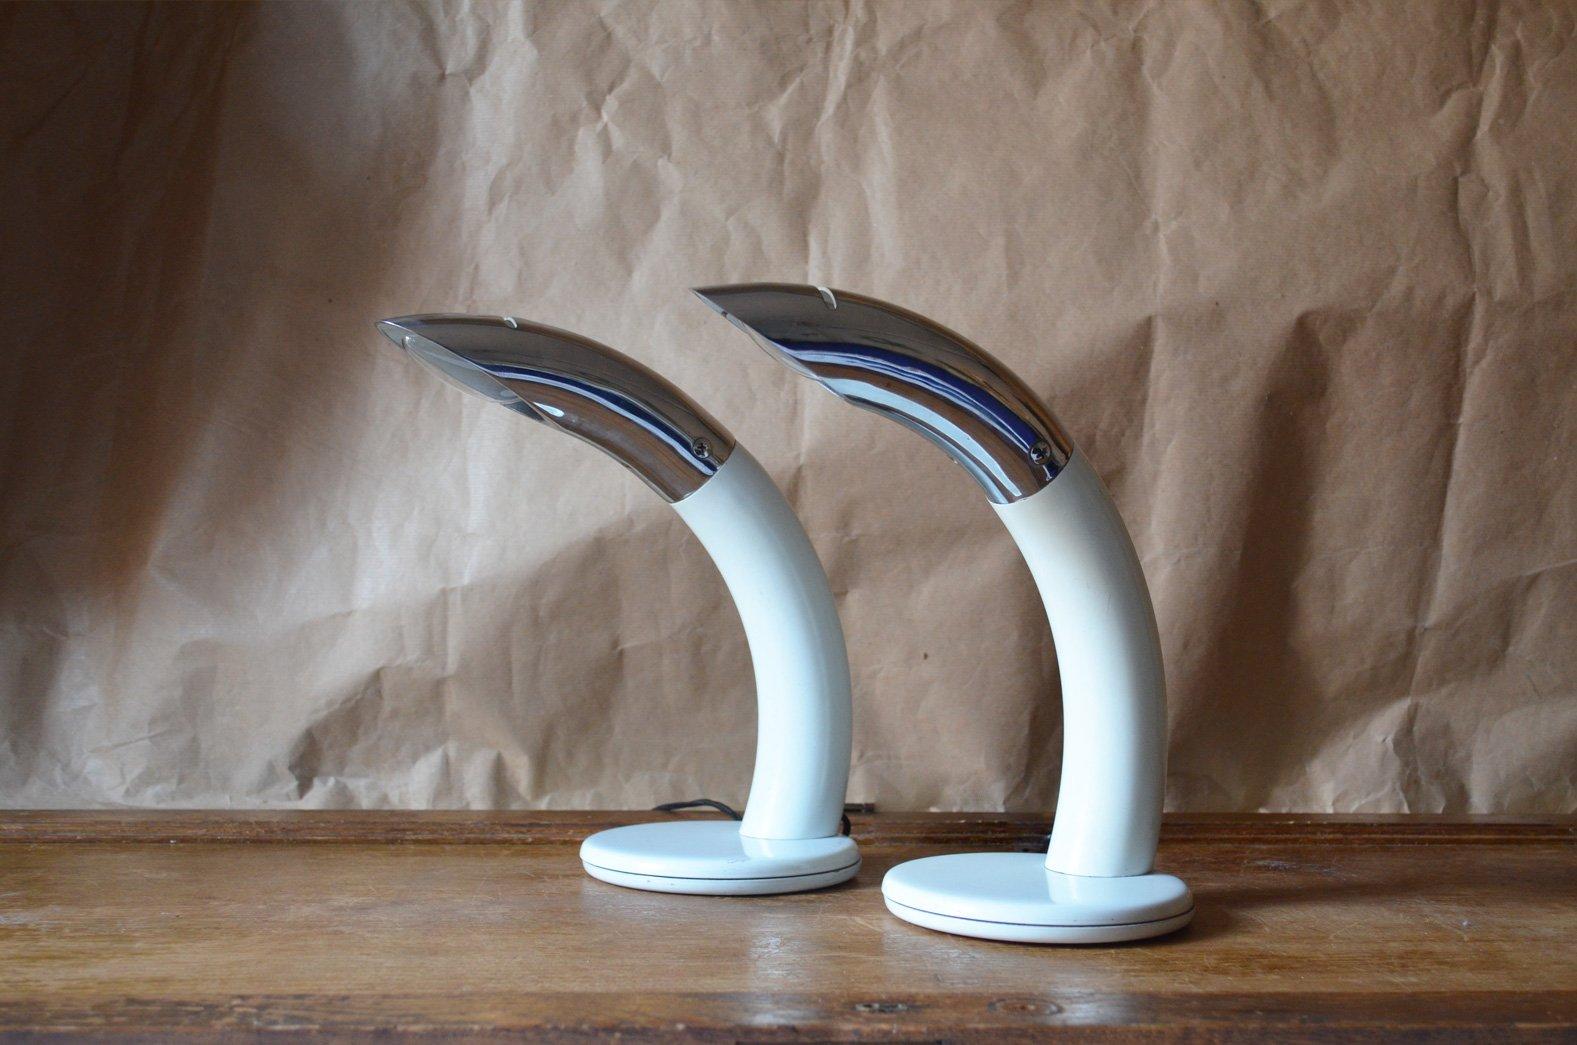 Vintage Flipper Lampen von Fase, 2er Set